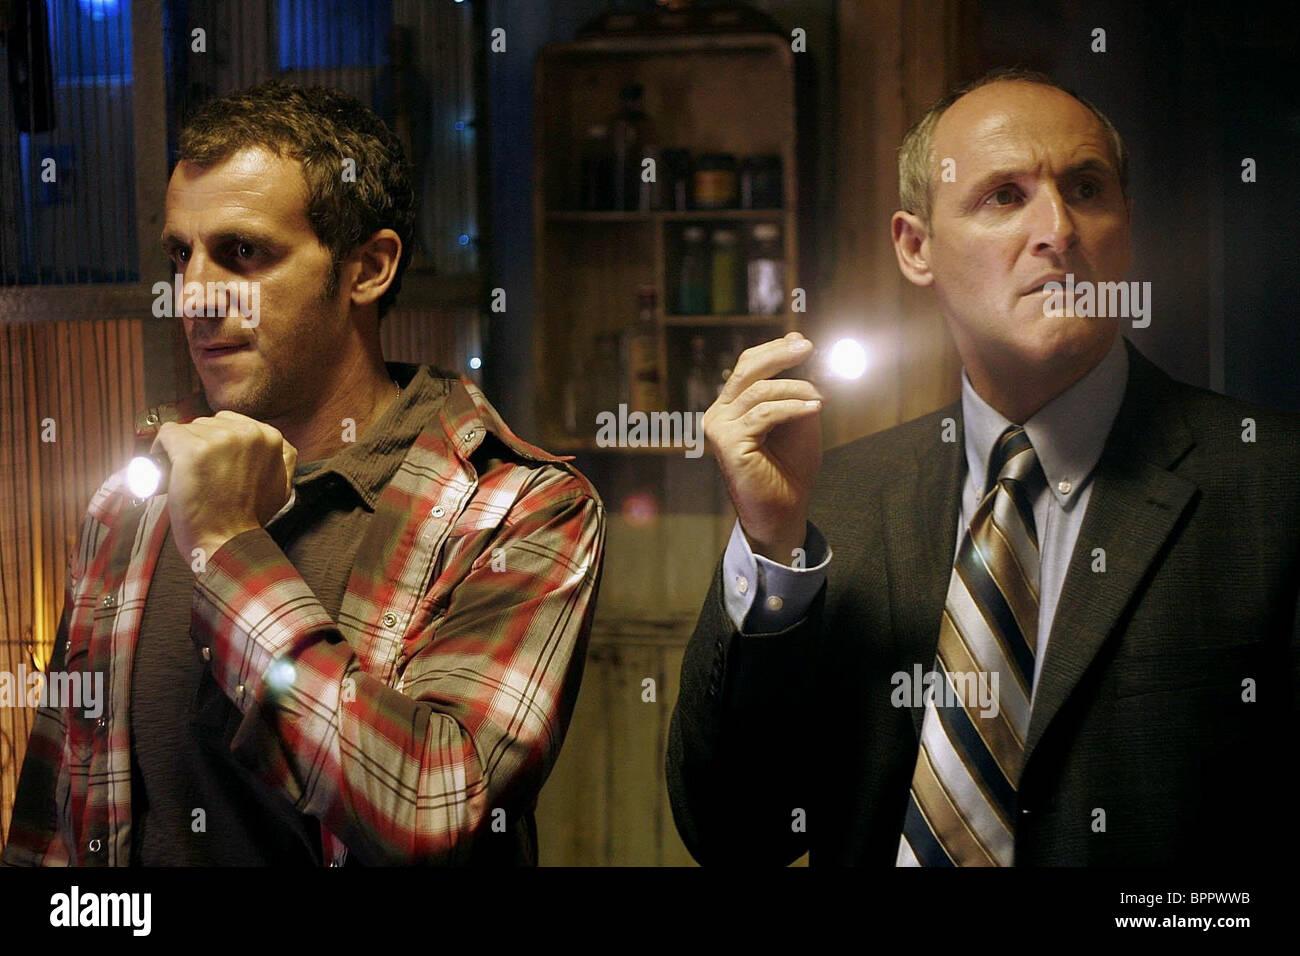 bon cop bad cop 2 full movie free download